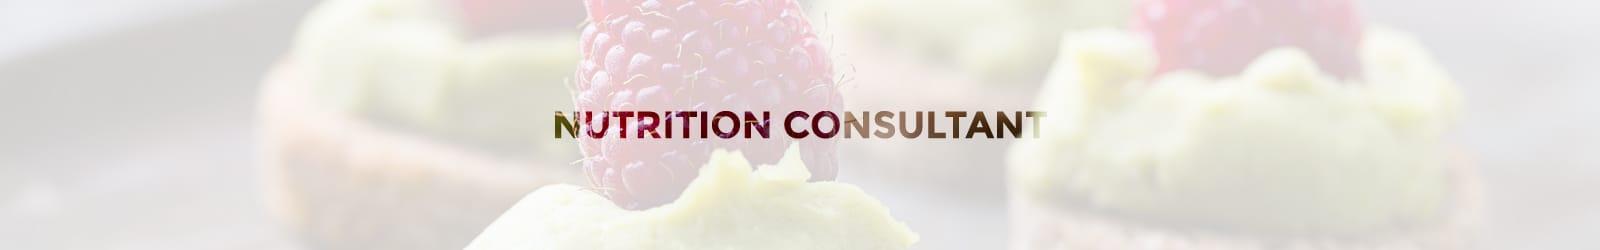 Promoting Optimal Health Through Nutrition - Bauman College